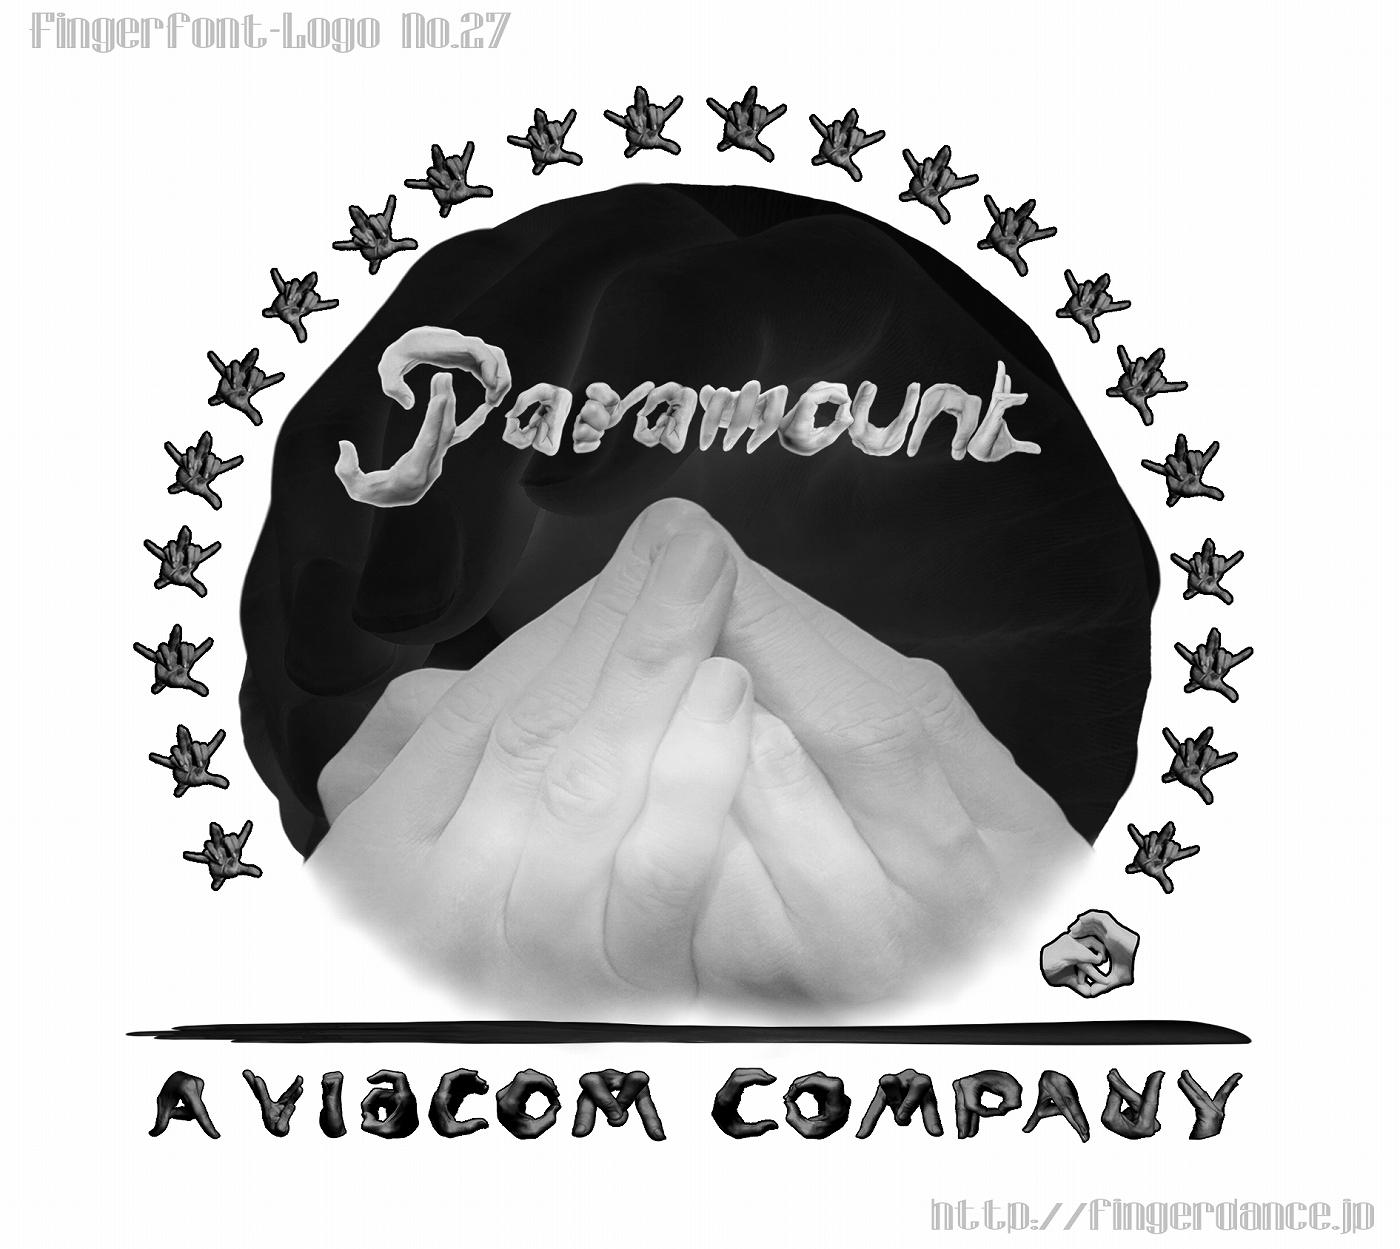 Paramount-fingerlogohand パラマウント映画フィンガーロゴハンド手指